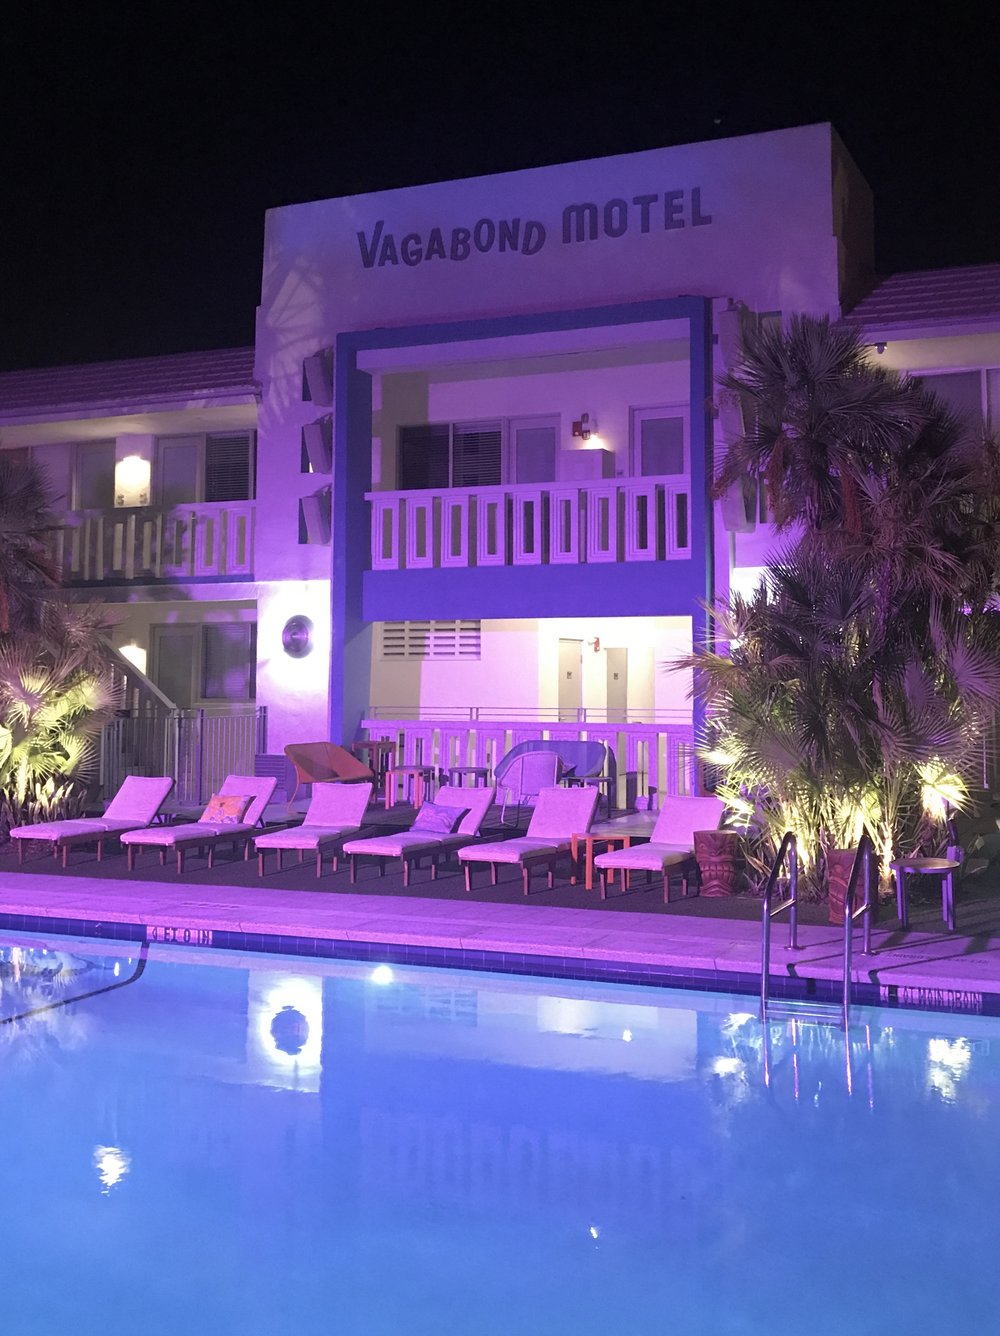 Vagabond Hotel and Pool Miami